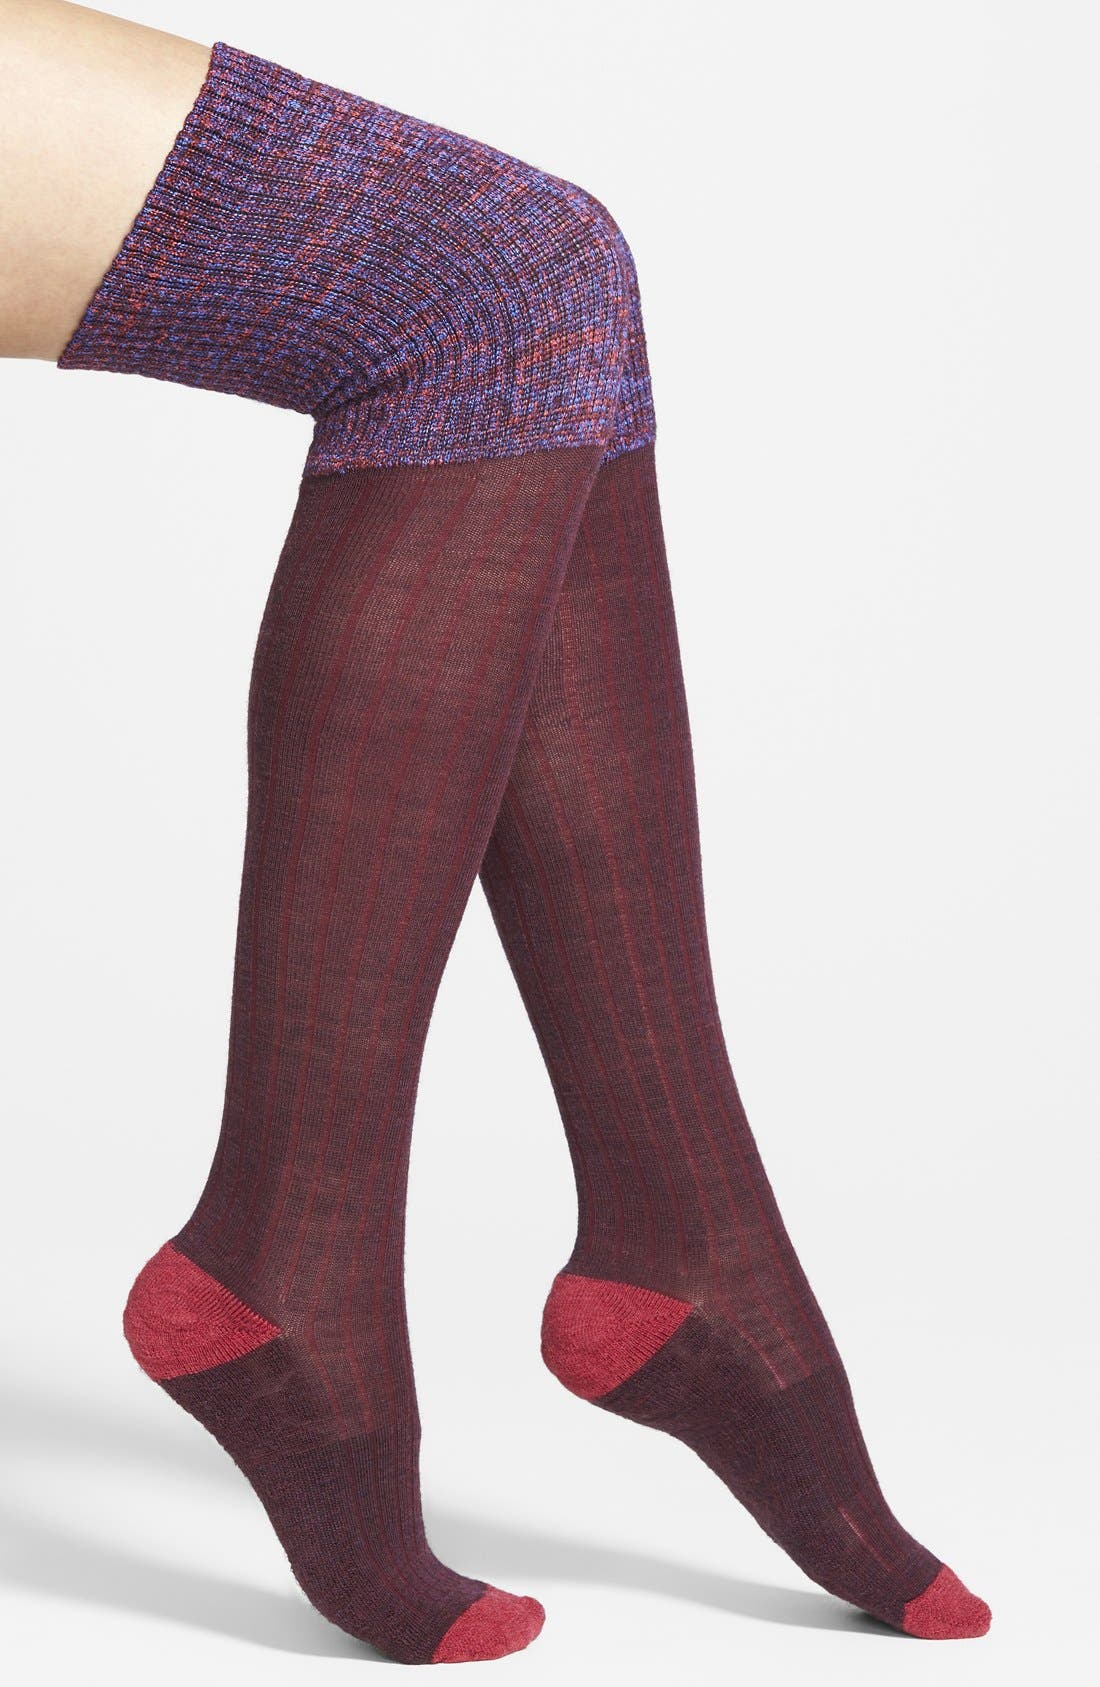 Main Image - Smartwool Over the Knee Socks